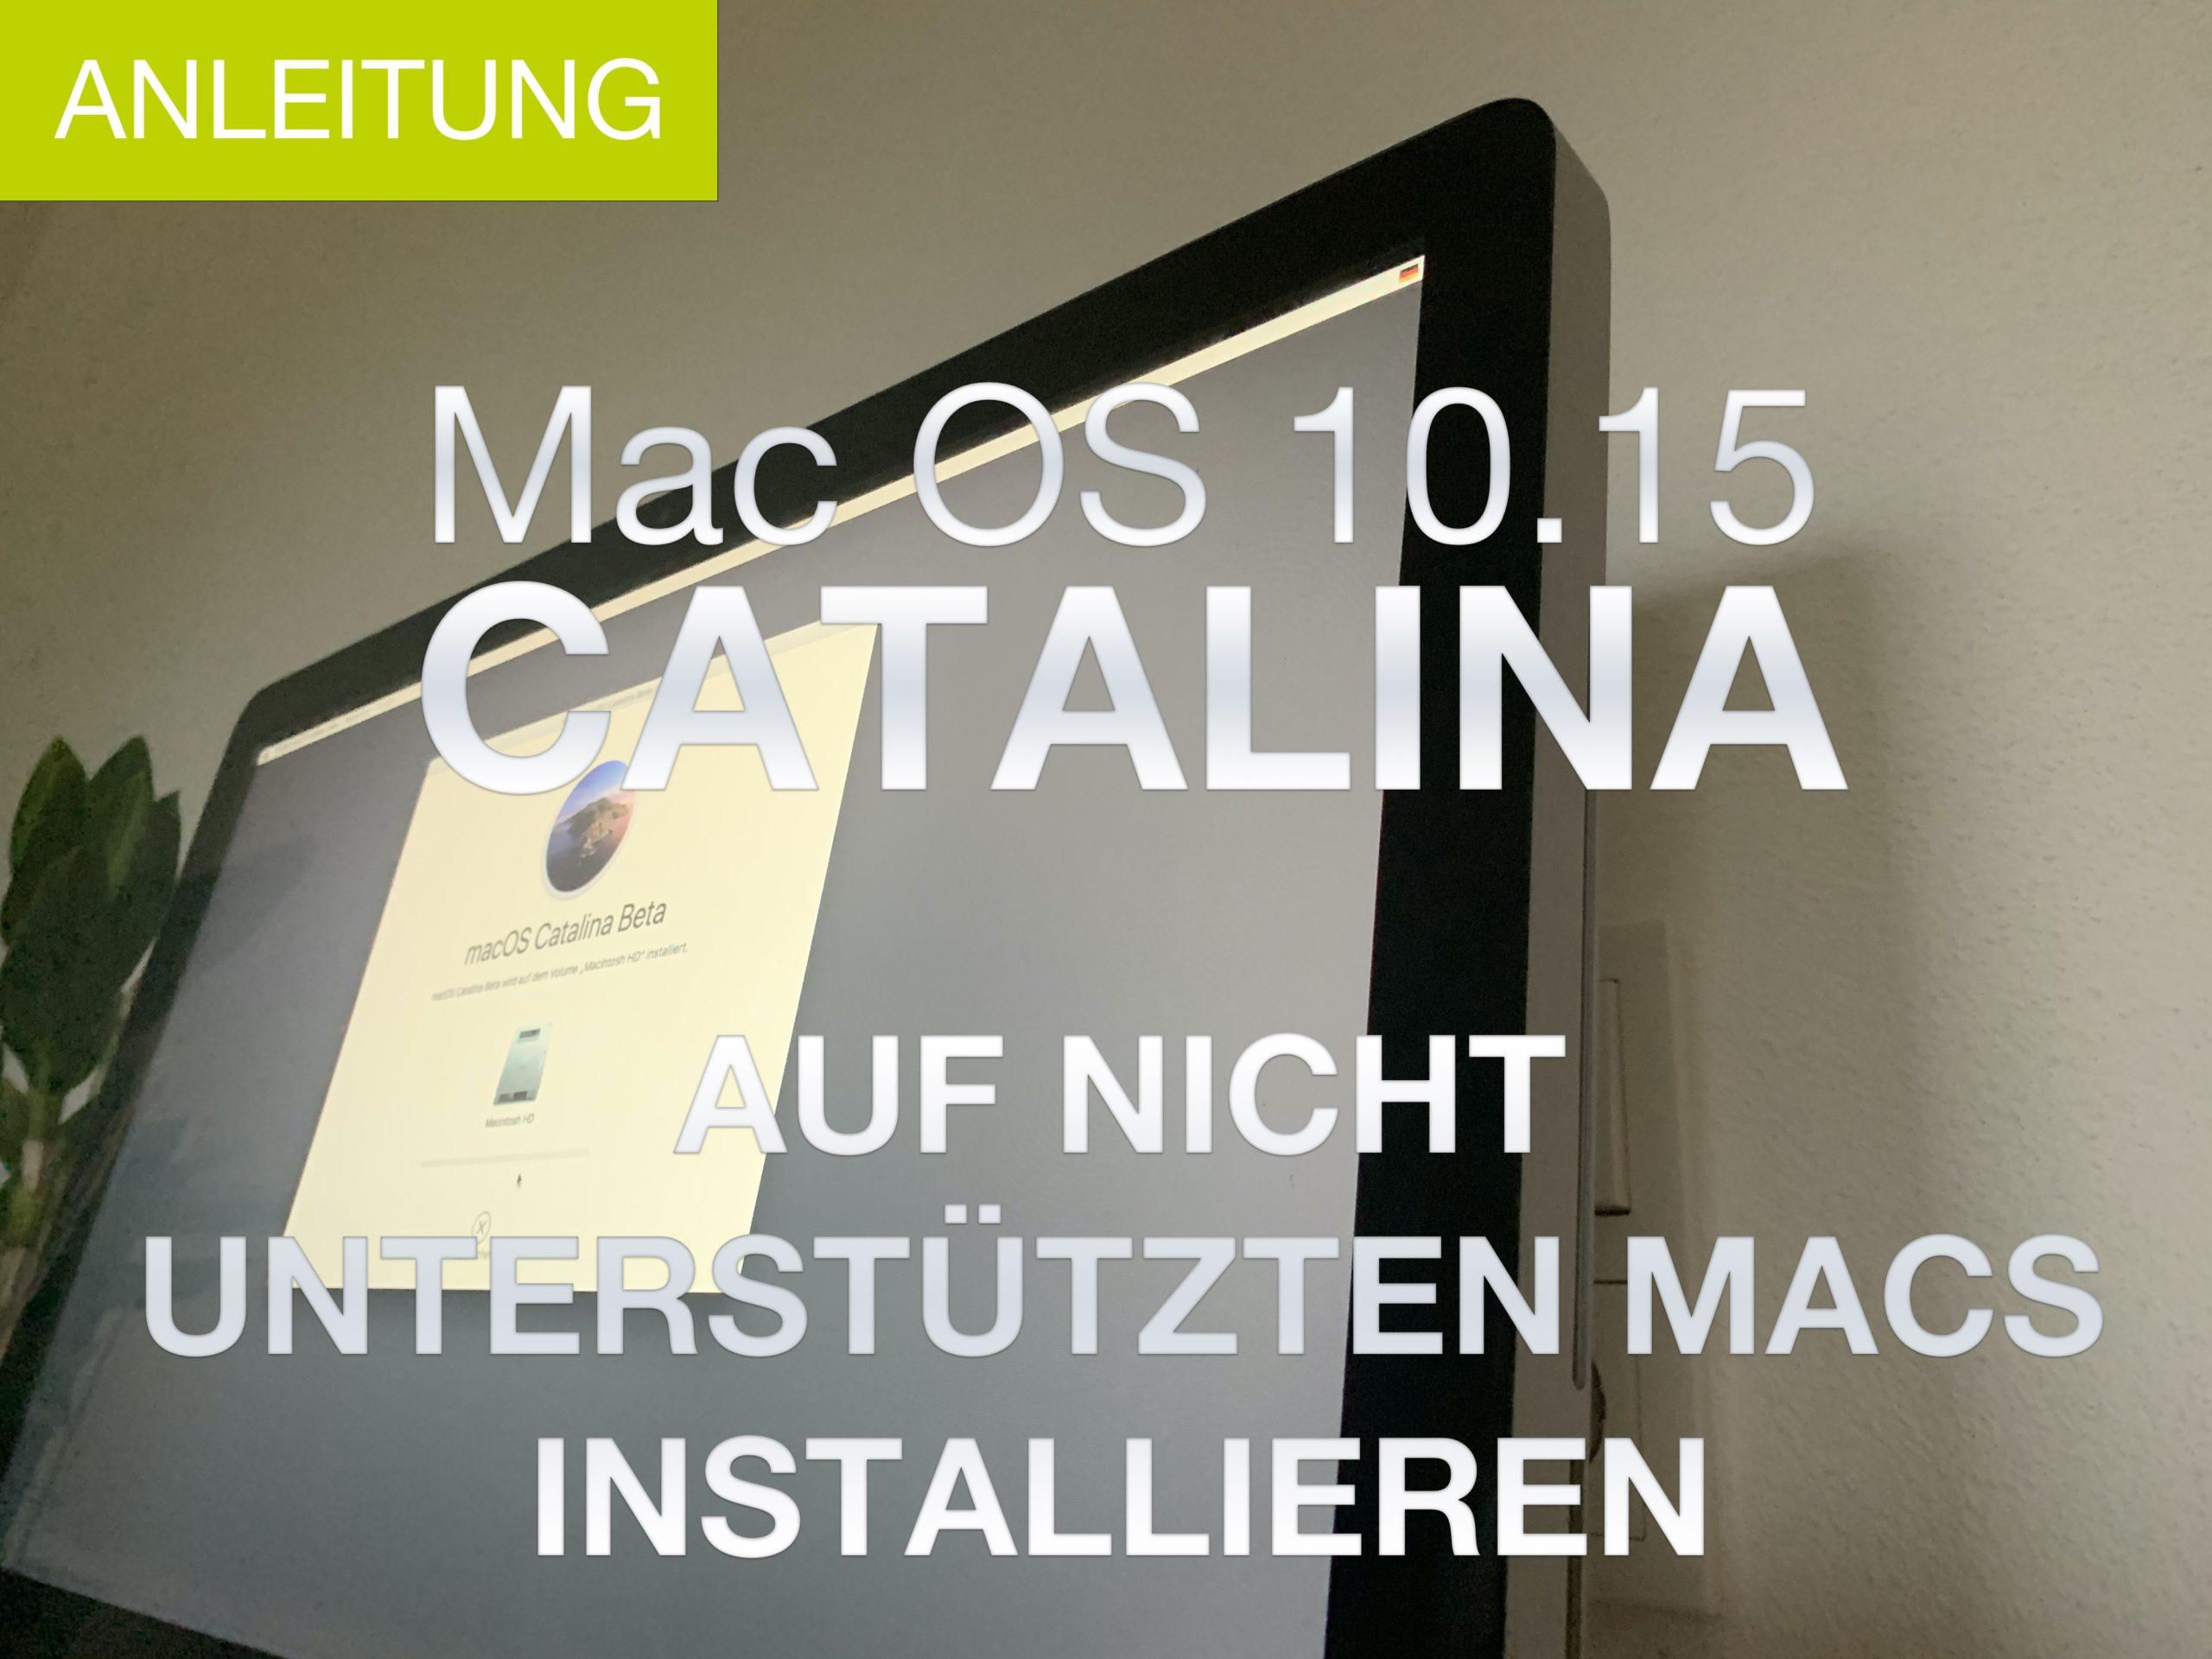 macOS 10.15 Catalina auf älteren Mac Installieren – Anleitung